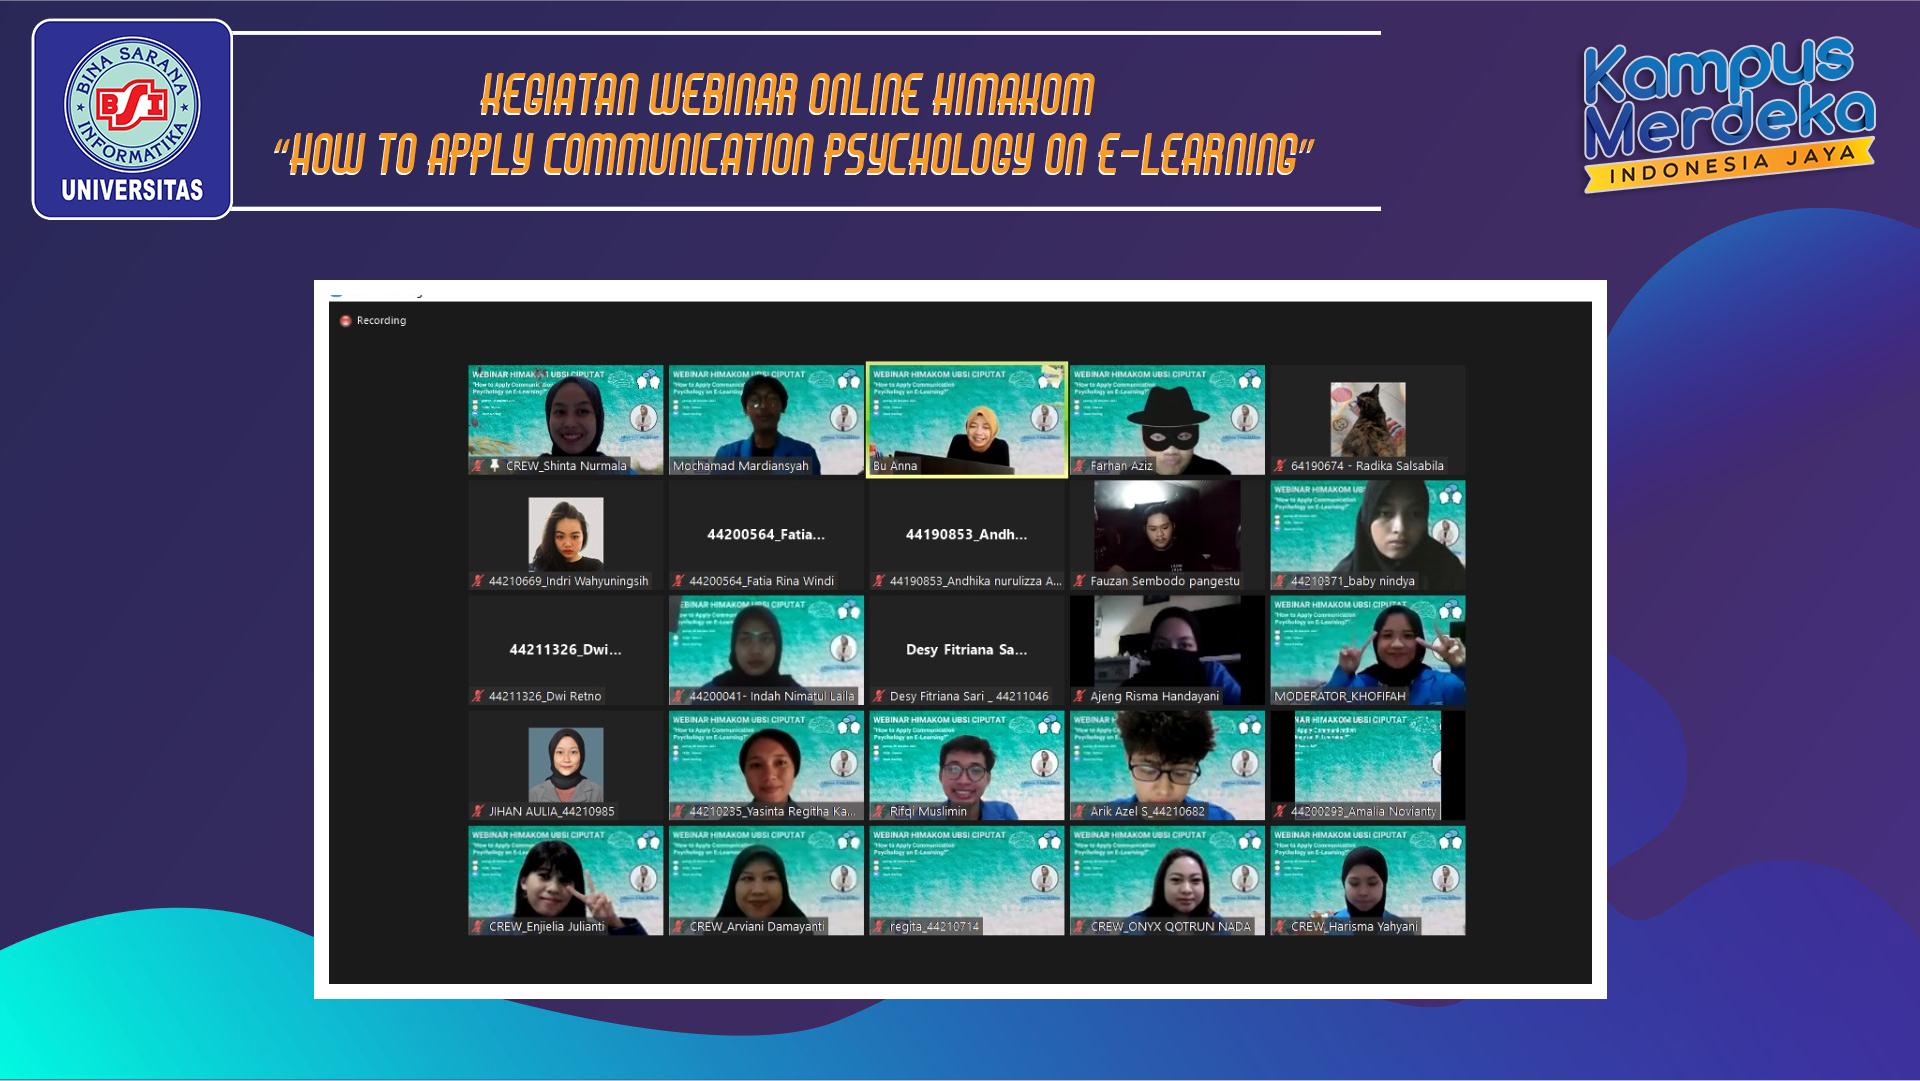 "KEGIATAN WEBINAR ONLINE HIMAKOM ""HOW TO APPLY COMMUNICATION PSYCHOLOGY ON E-LEARNING"""